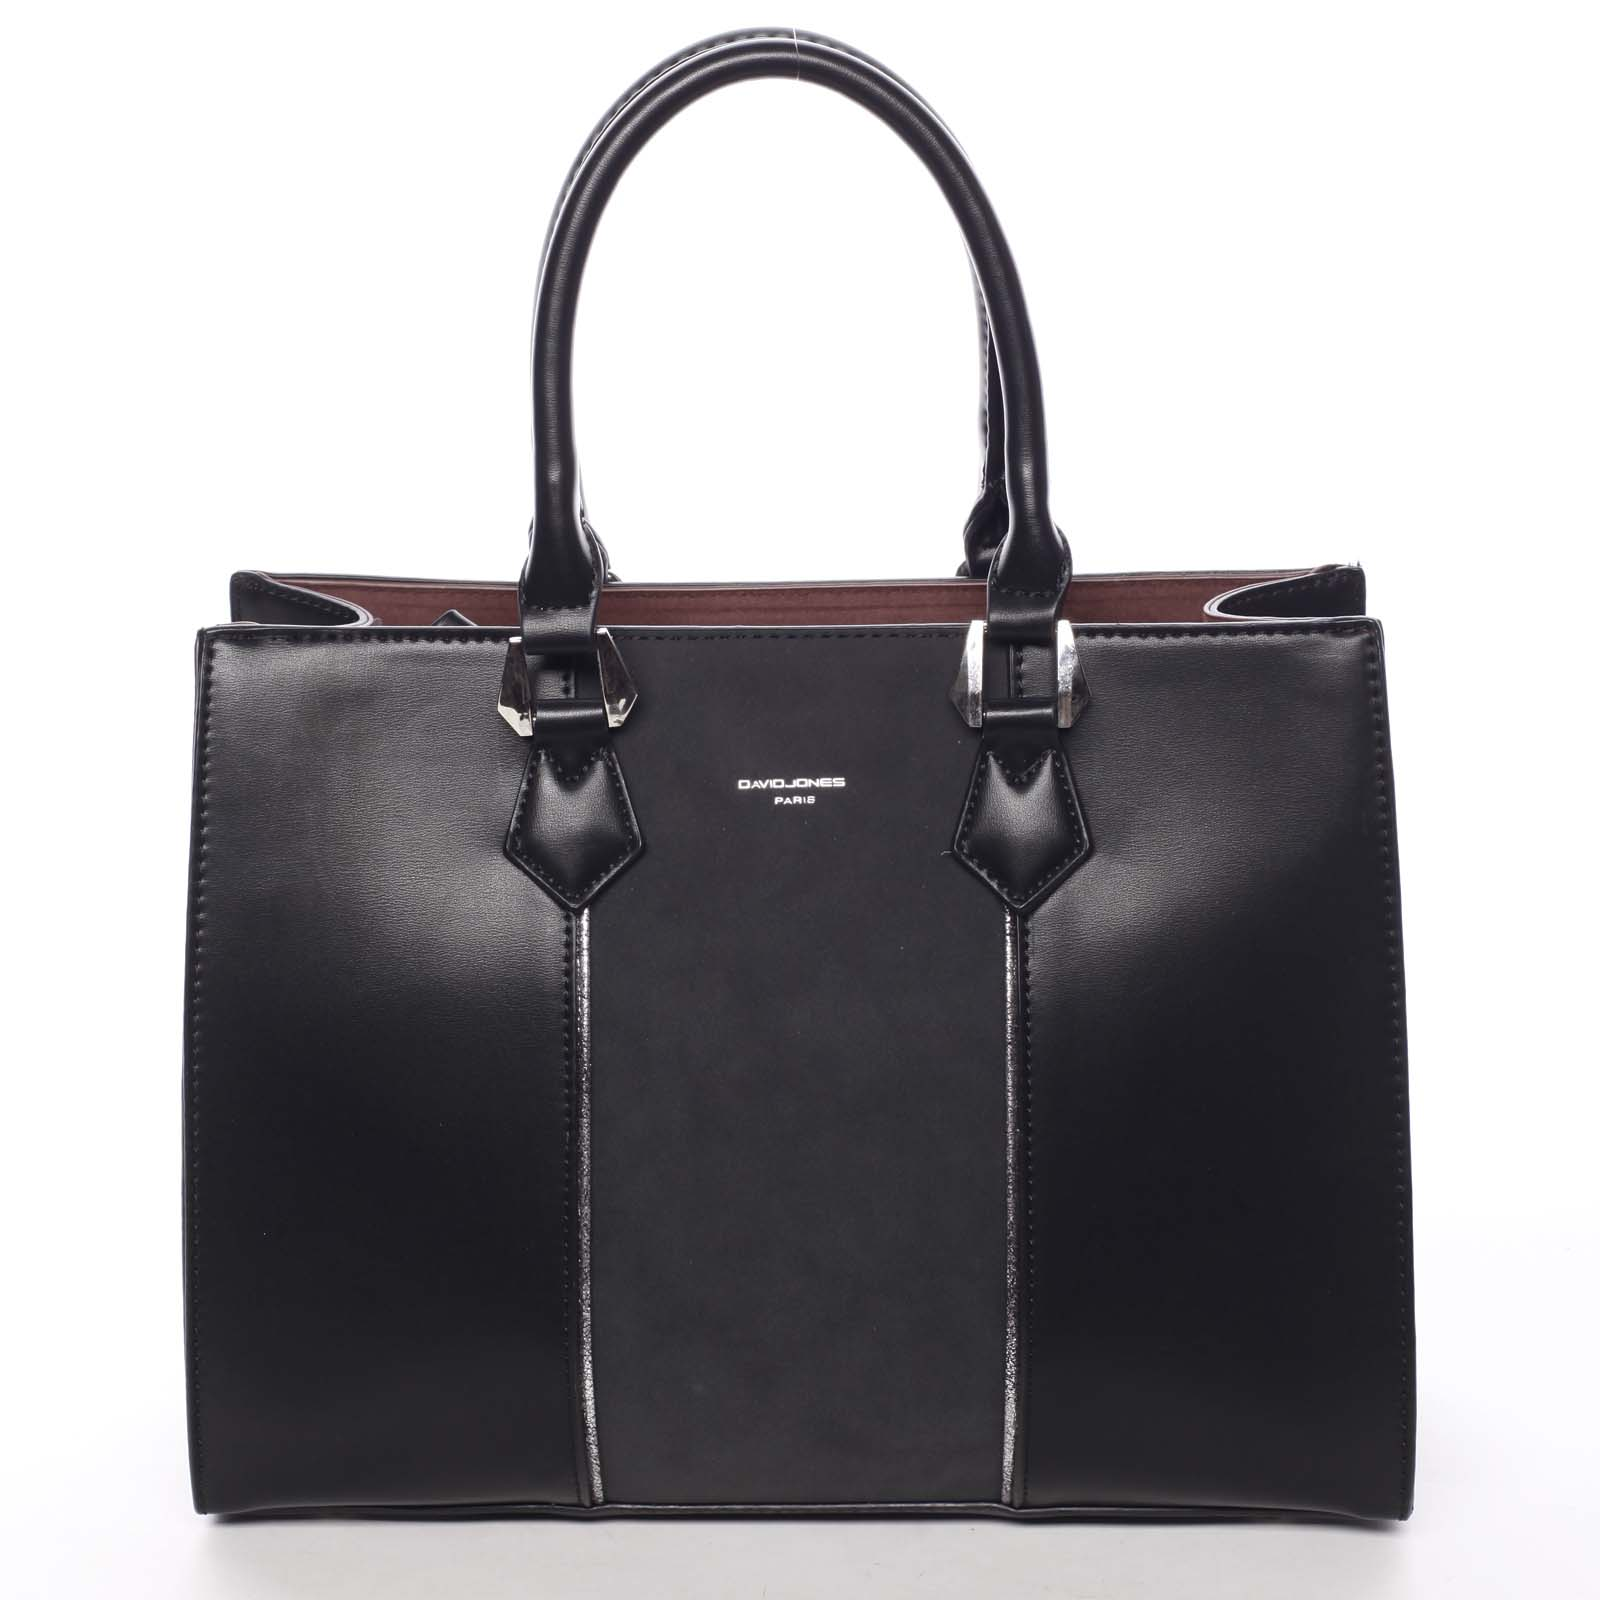 Elegantná dámska čierna kabelka do ruky - David Jones Zeruiah čierna ... d783d63f7ec